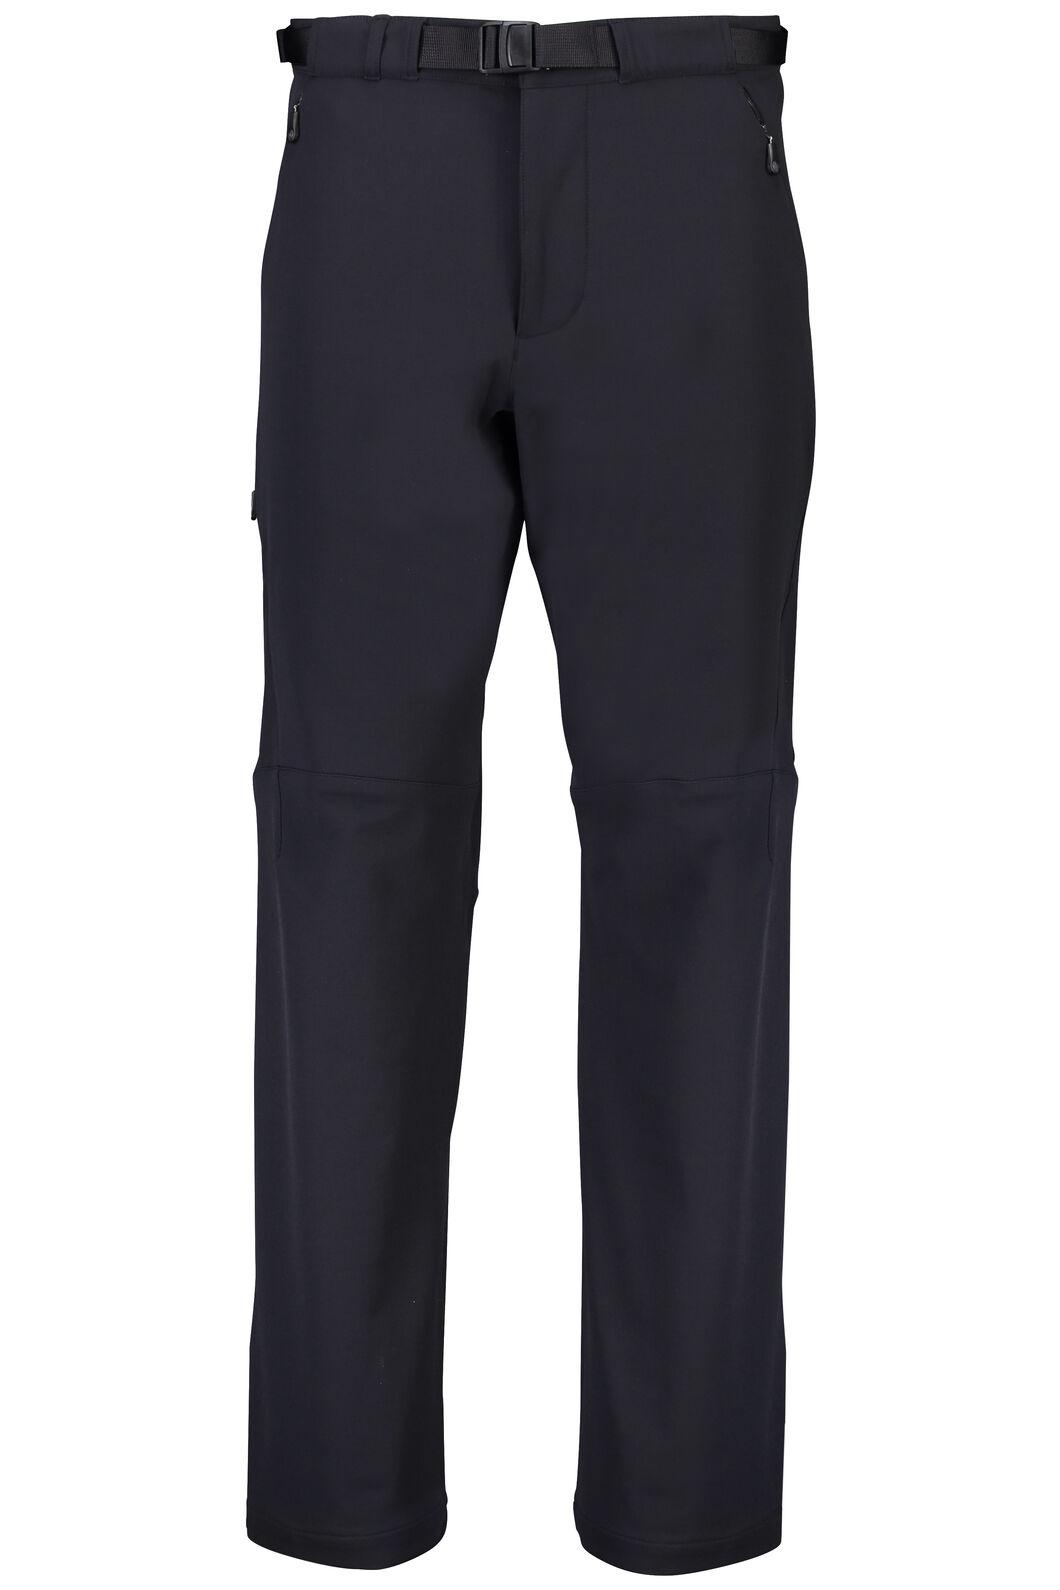 Macpac Nemesis Softshell Pants - Men's, Black, hi-res